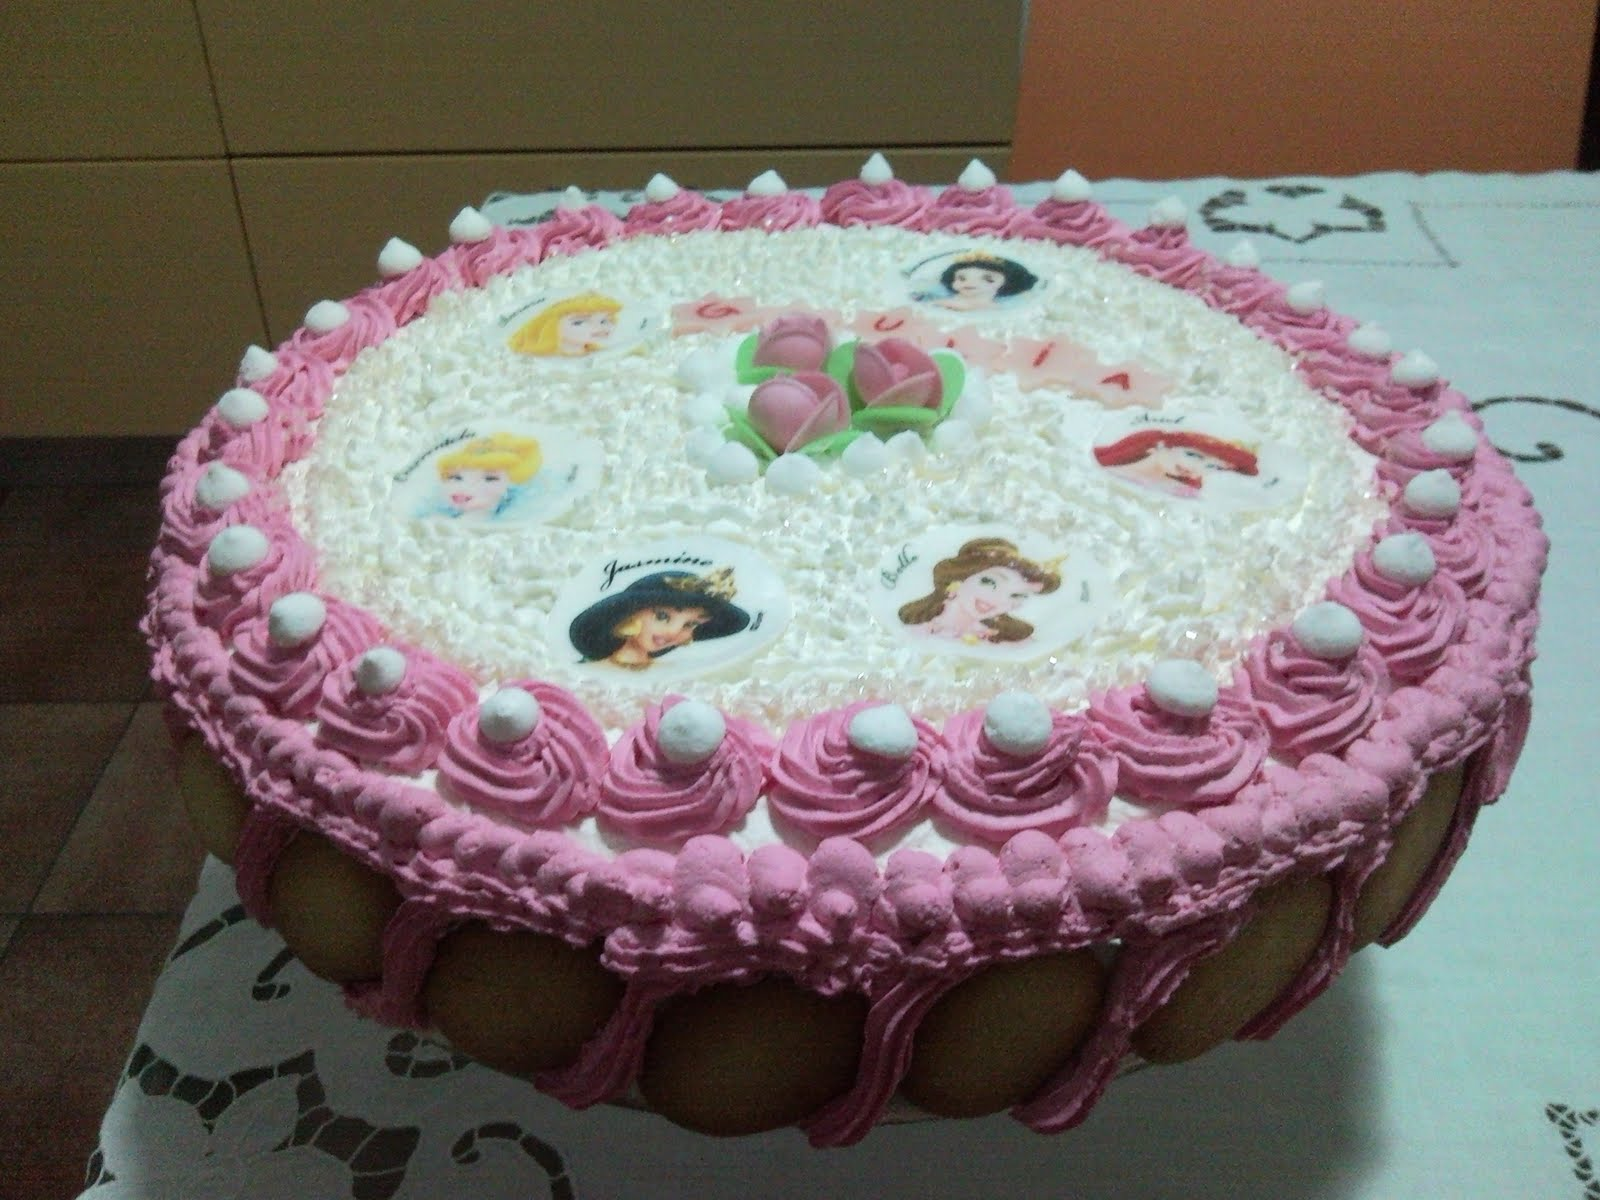 Cake Design Principesse Disney : Fammi una torta!: Principesse disney